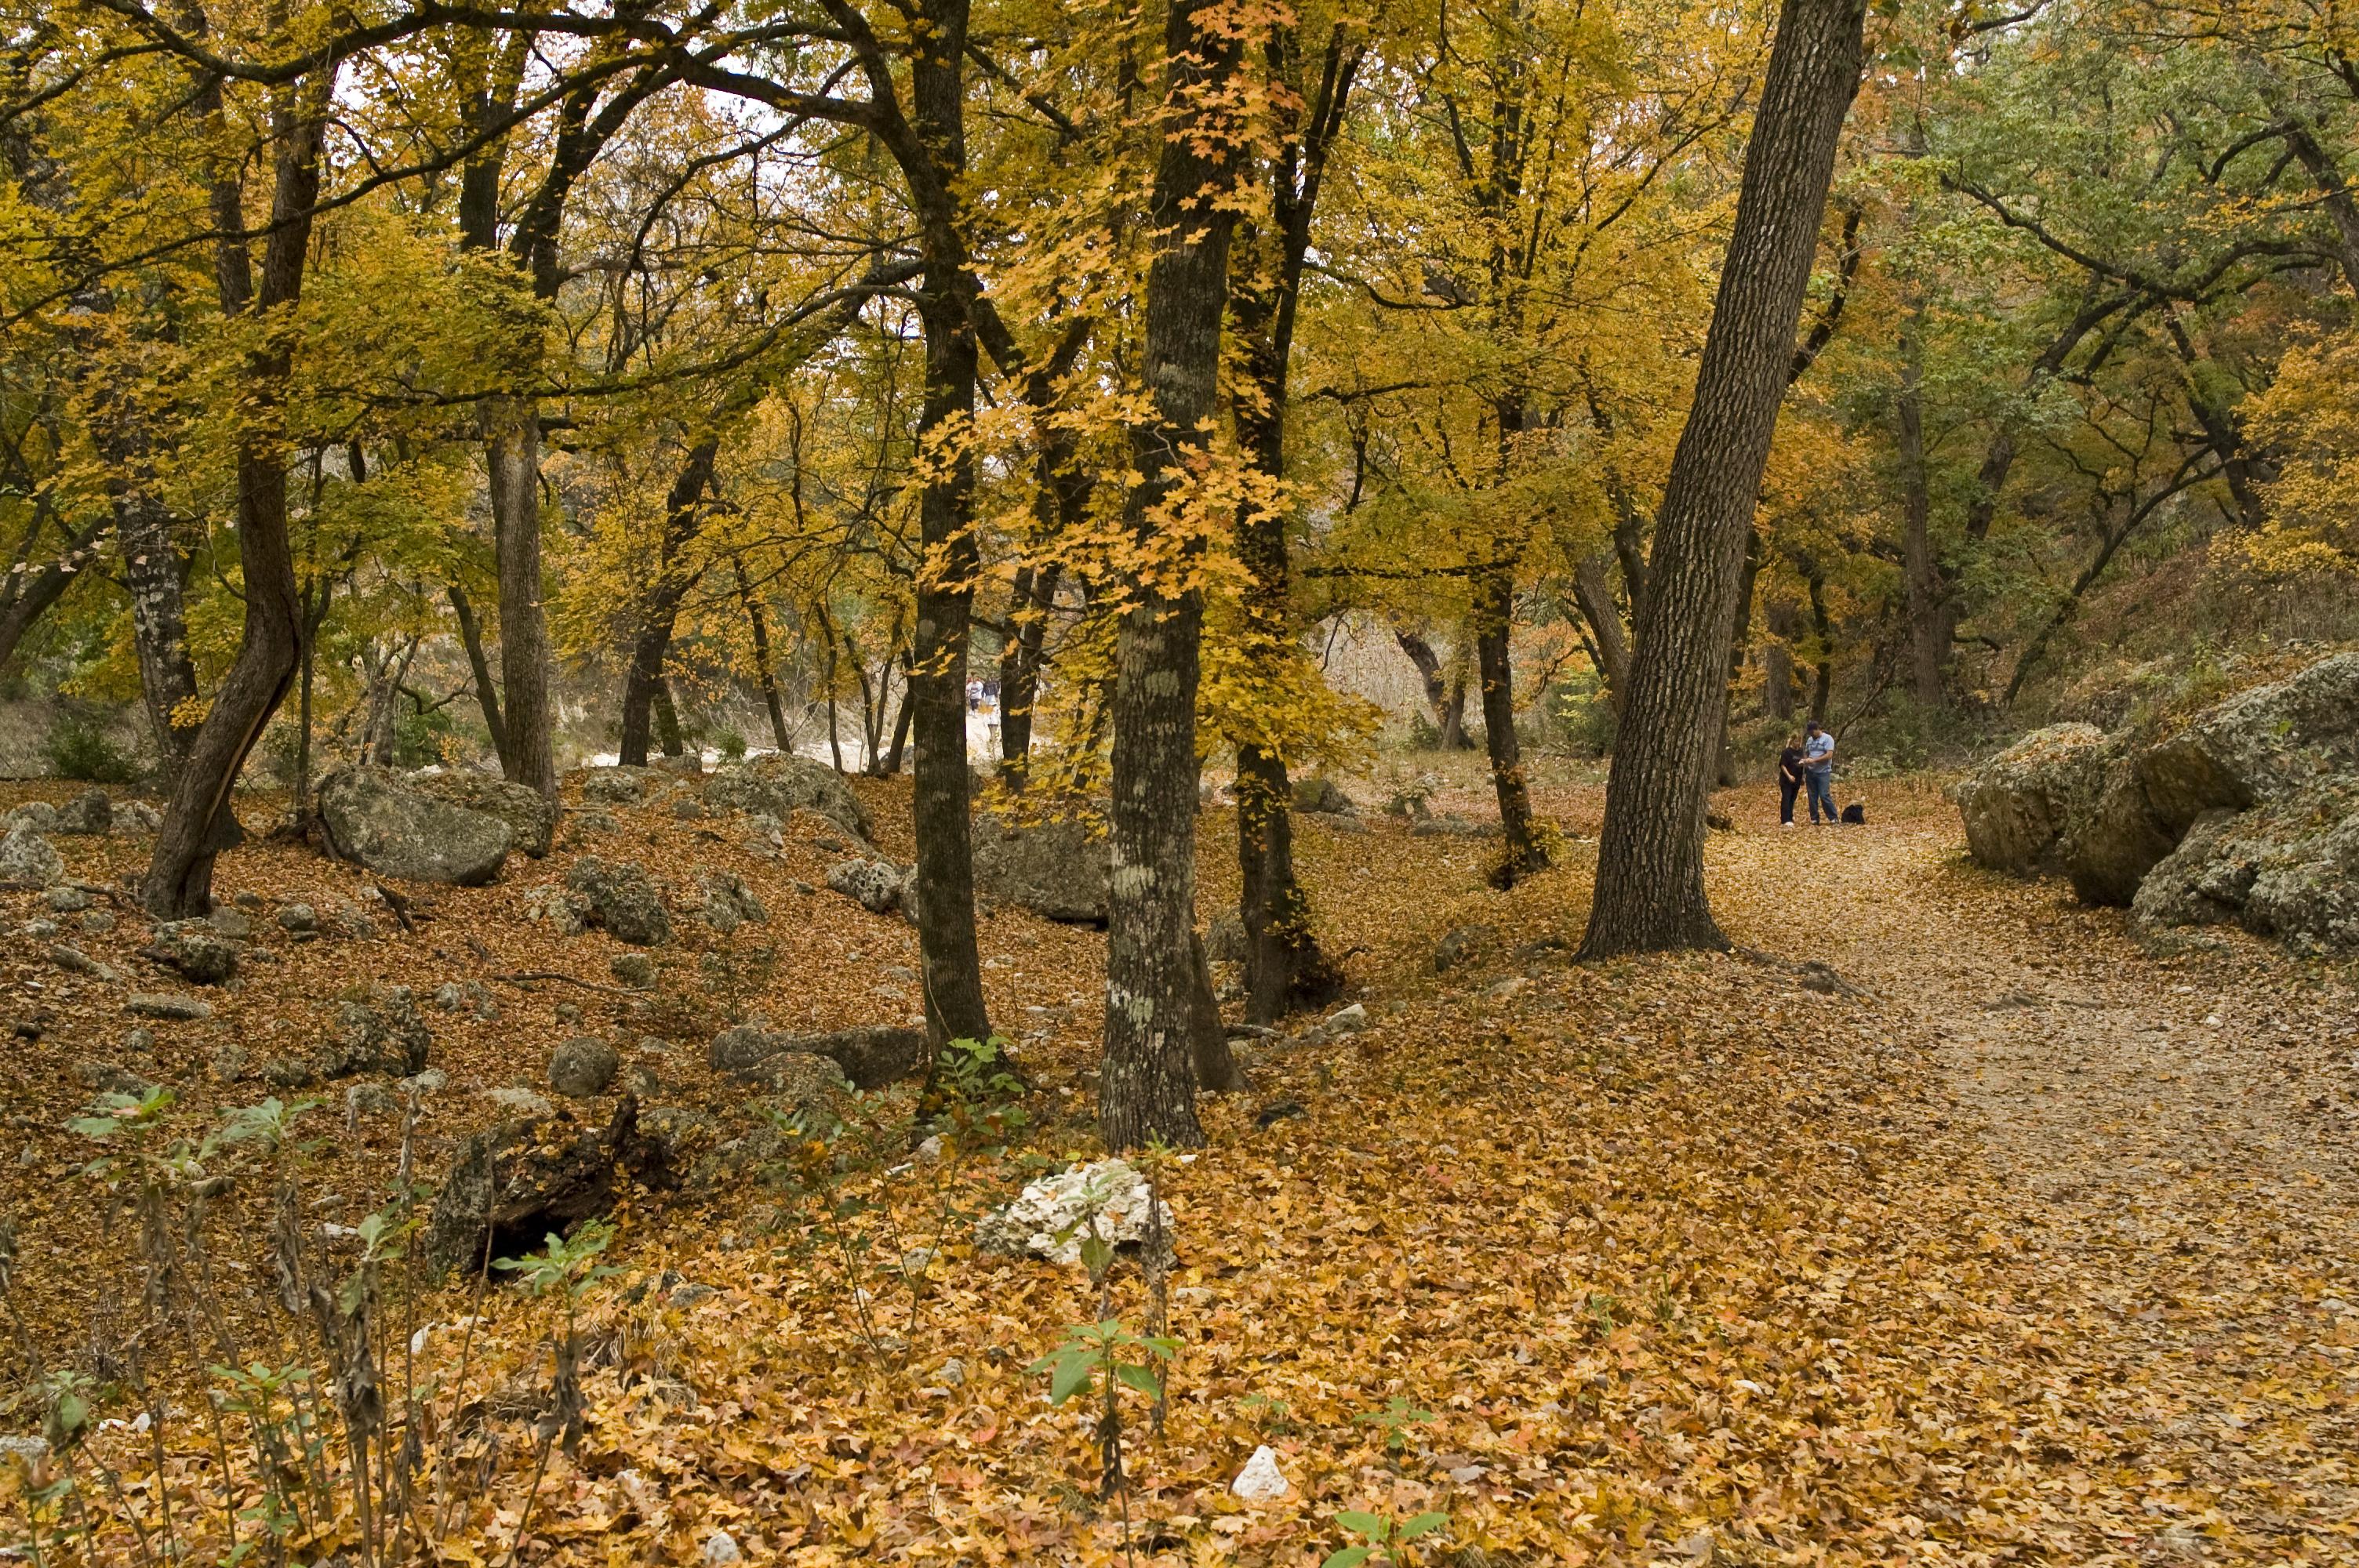 Resultado de imagem para Lost Maples State Natural Area